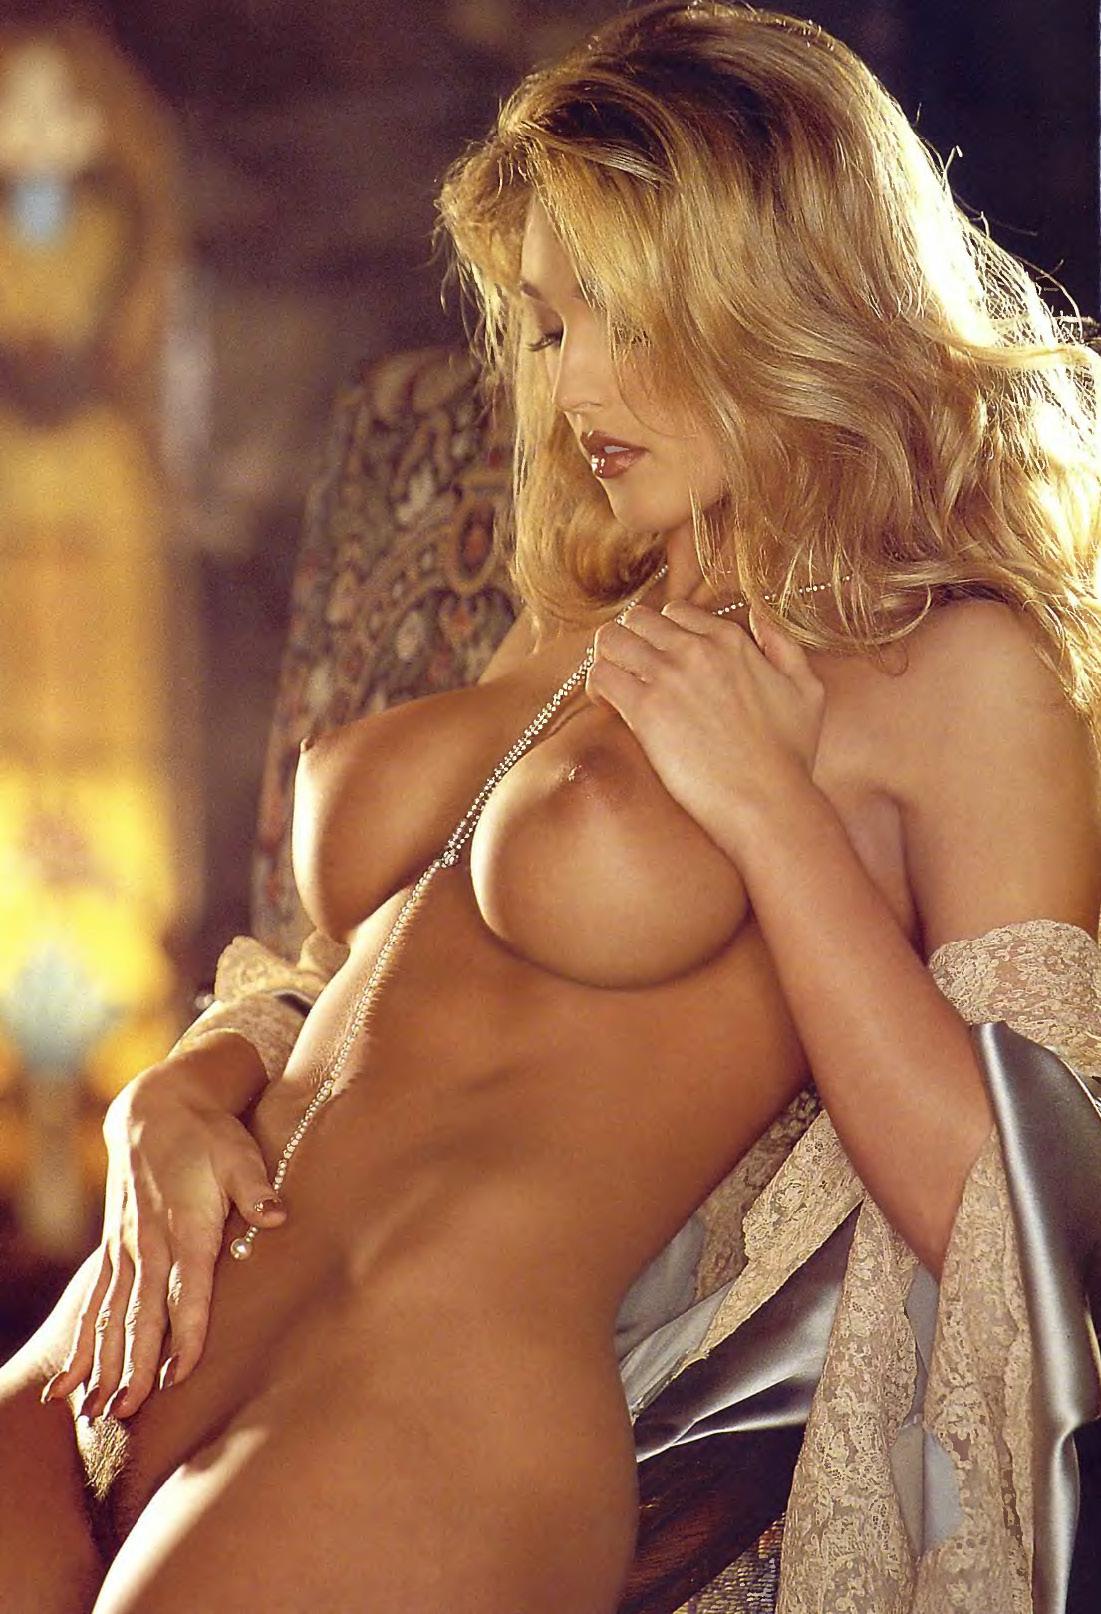 adonna ebony nude model